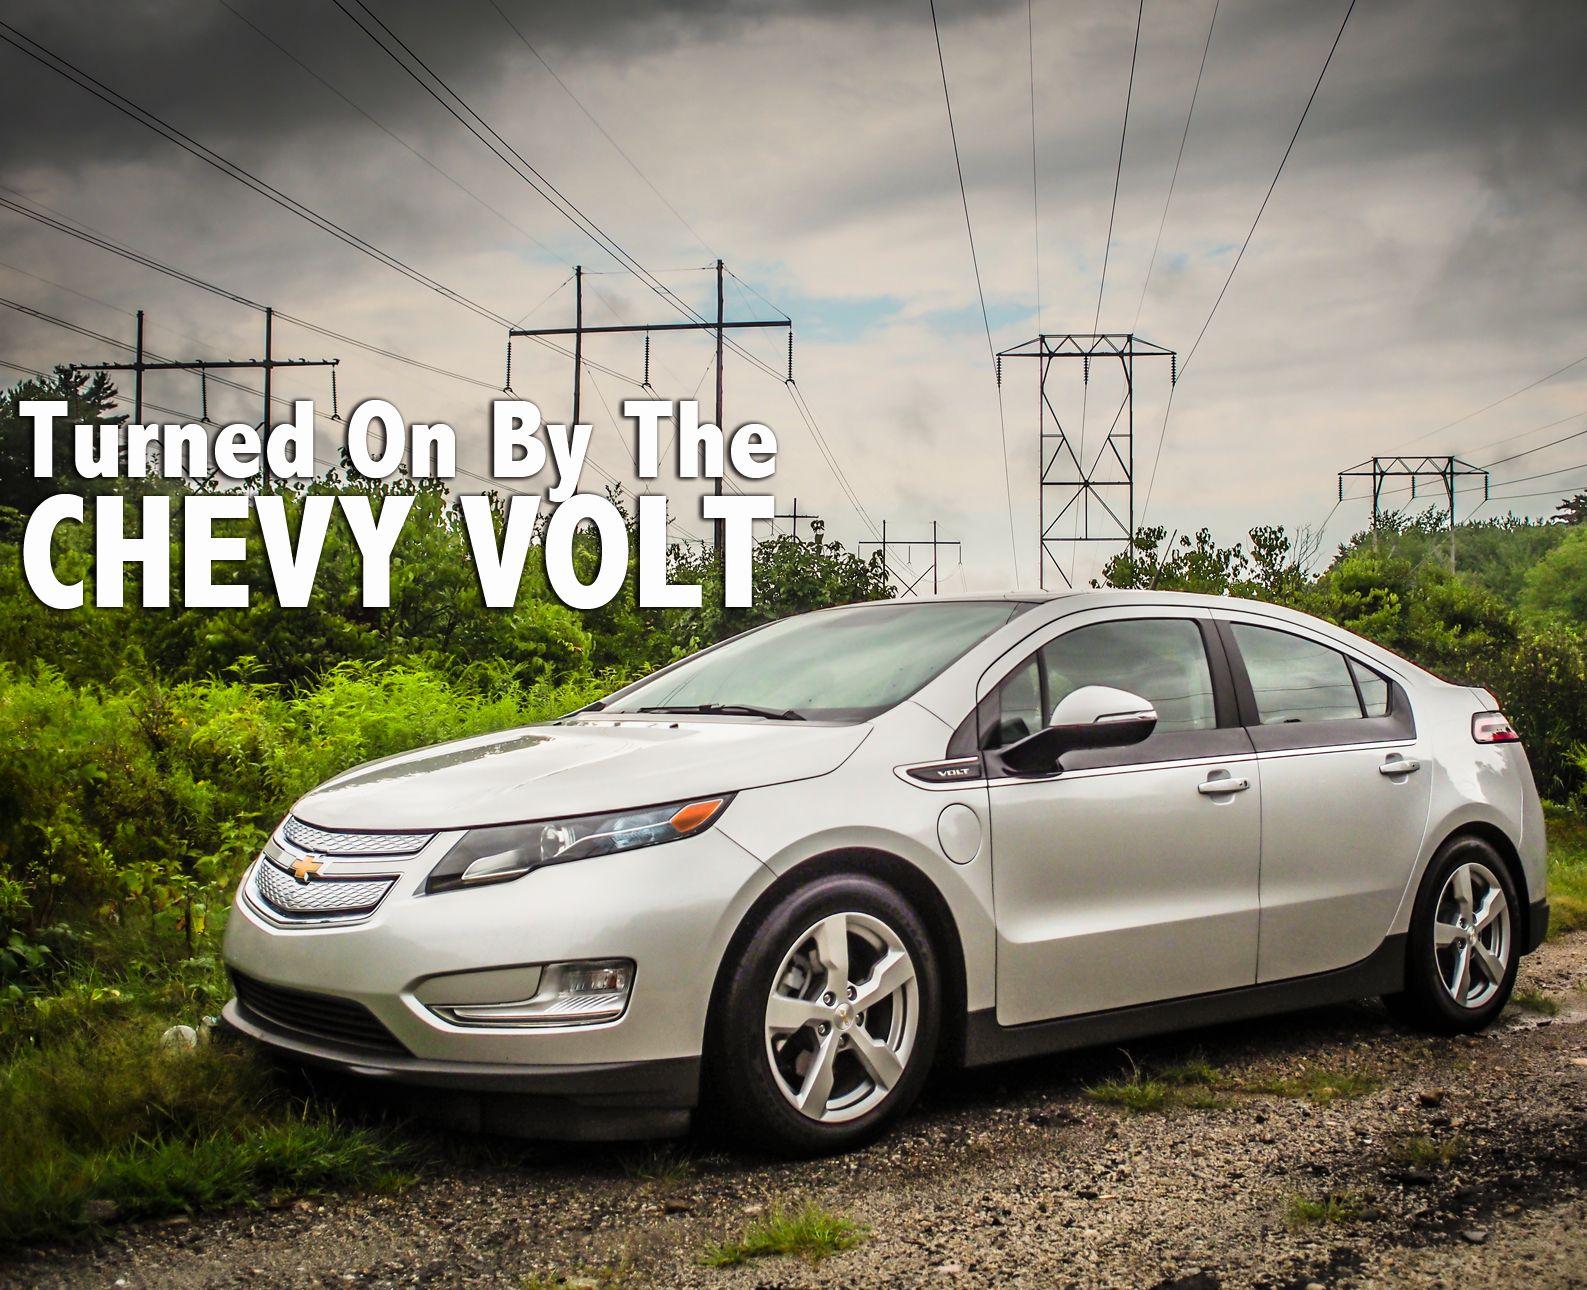 Chevy Volt Electric Vehicle Bumper Sticker